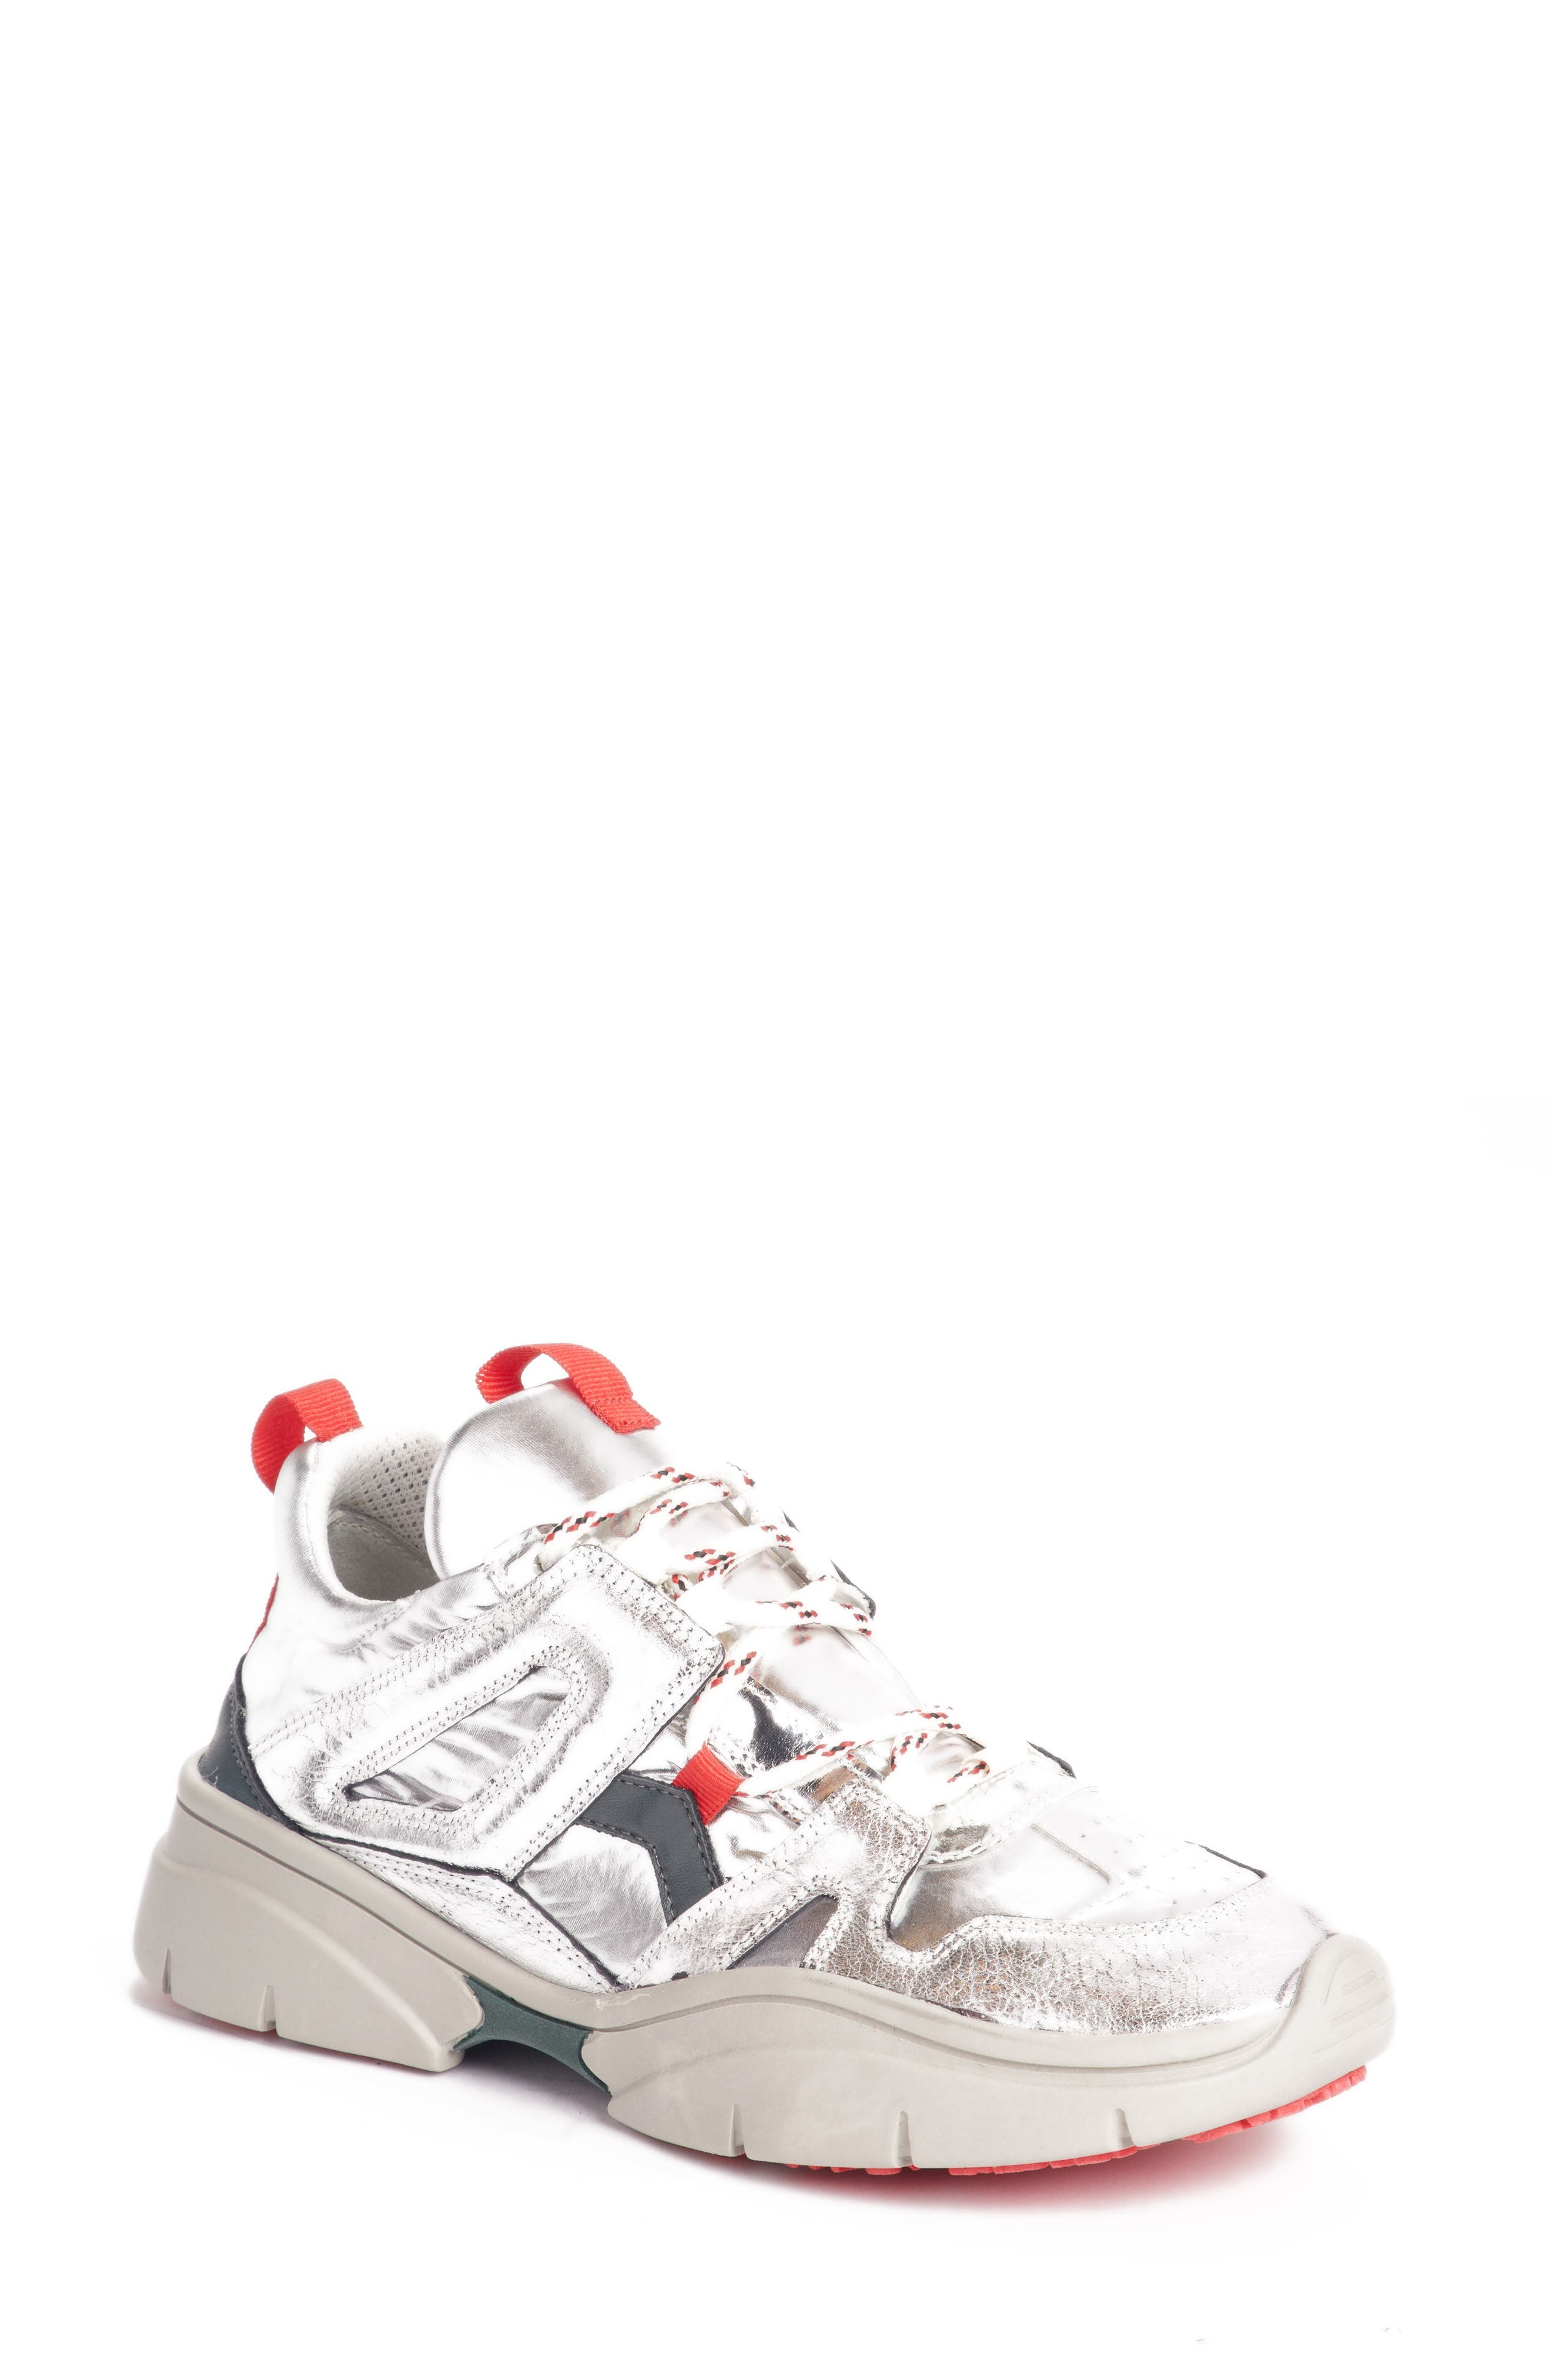 Kindsay Sneaker,                             Main thumbnail 1, color,                             040